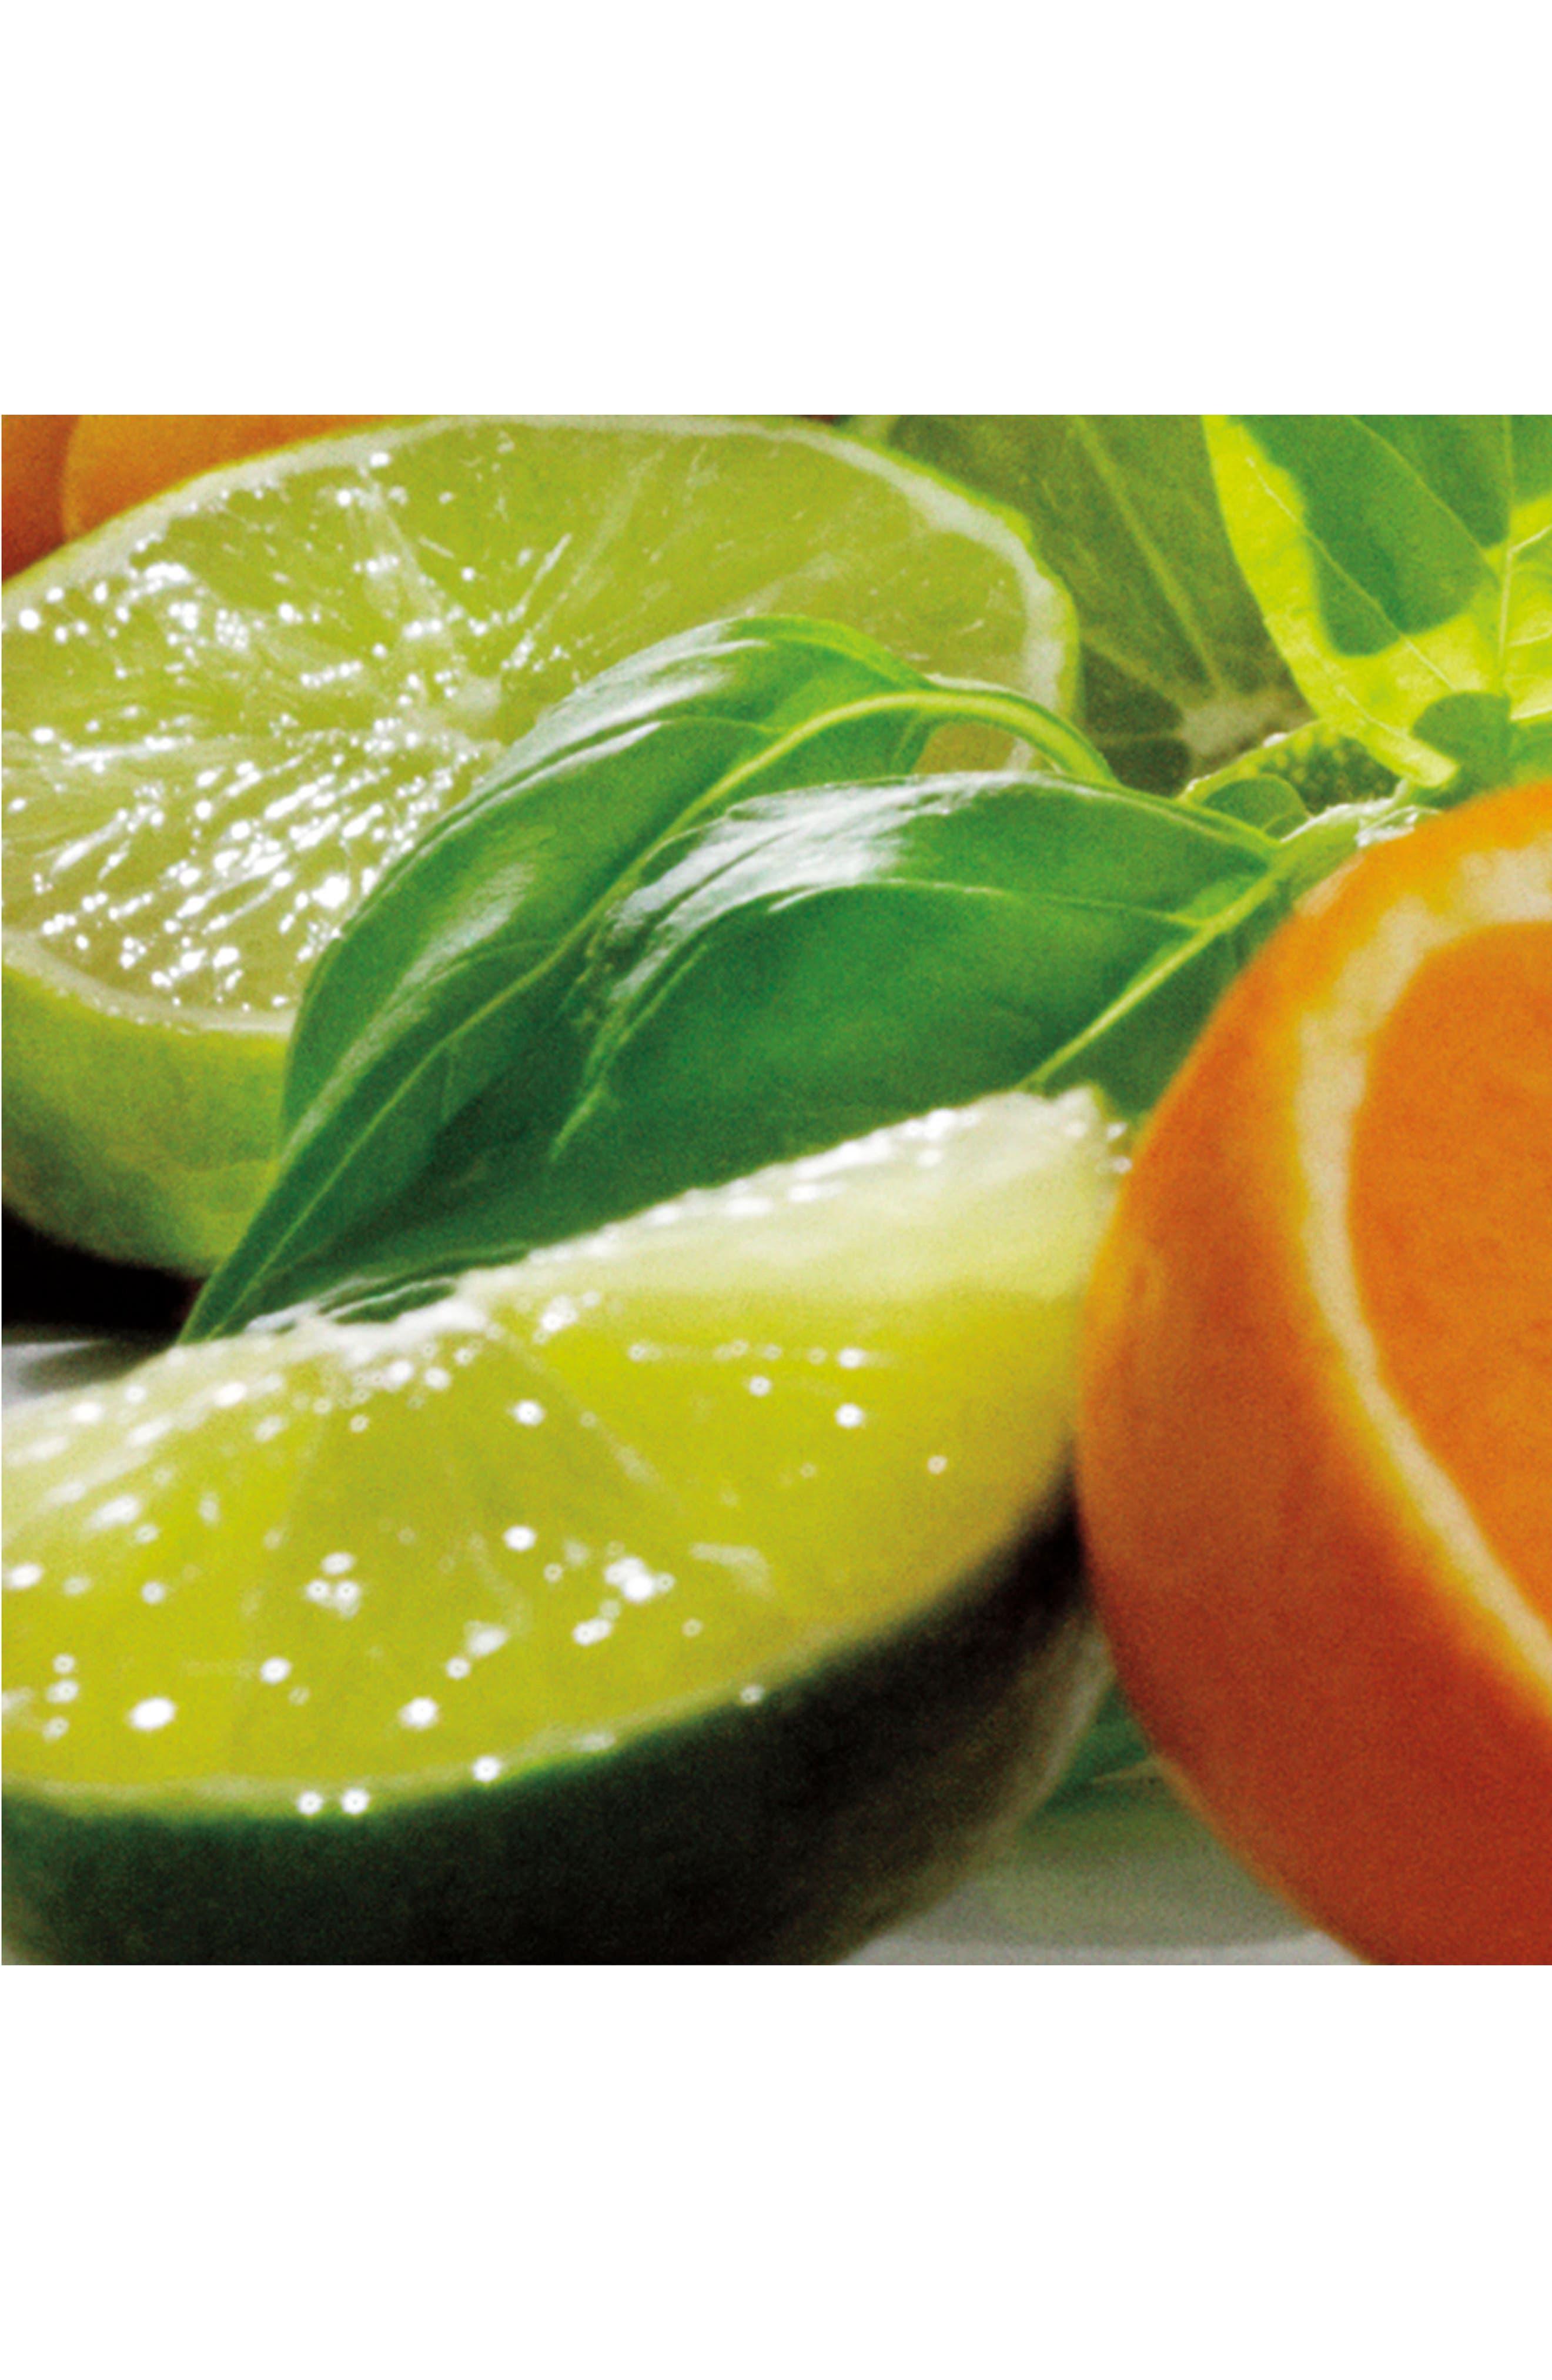 Lime Basil & Mandarin Body & Hand Wash,                             Alternate thumbnail 3, color,                             No Color